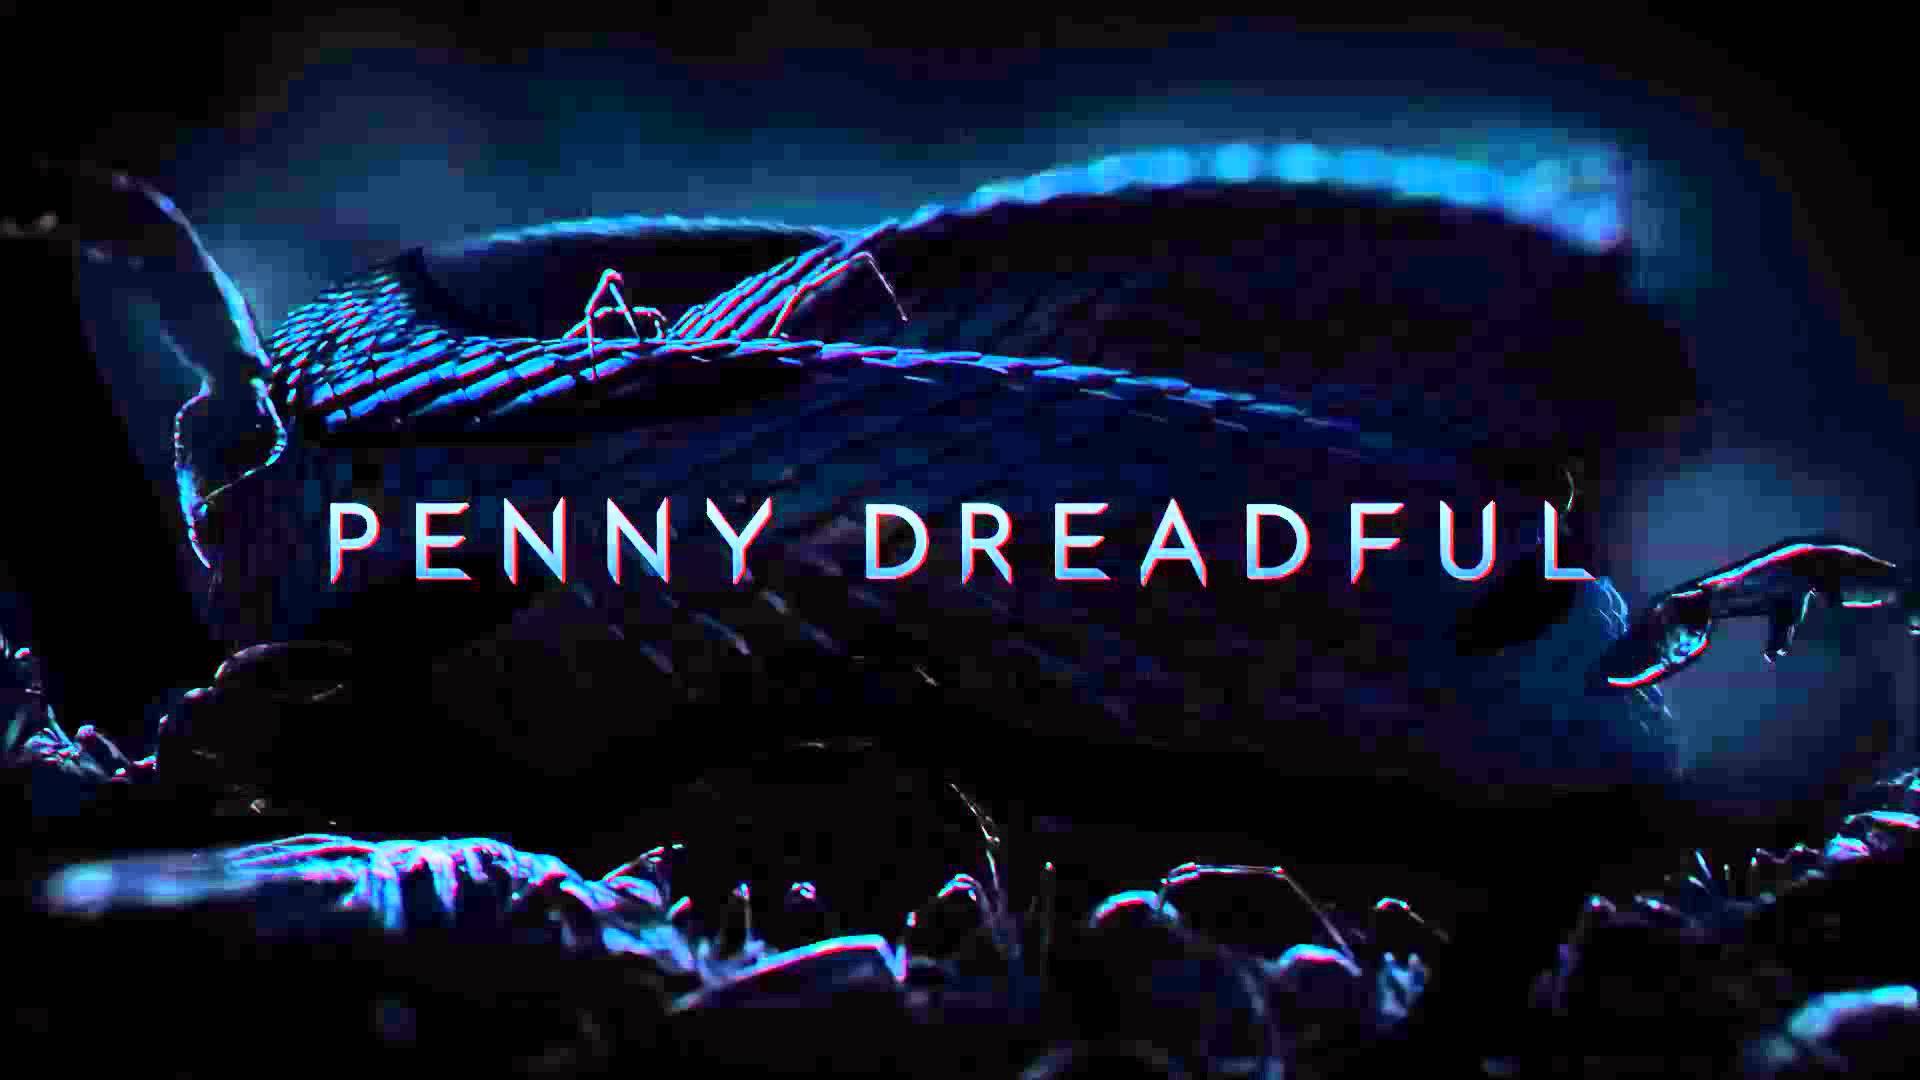 Title shot of Penny Dreadful